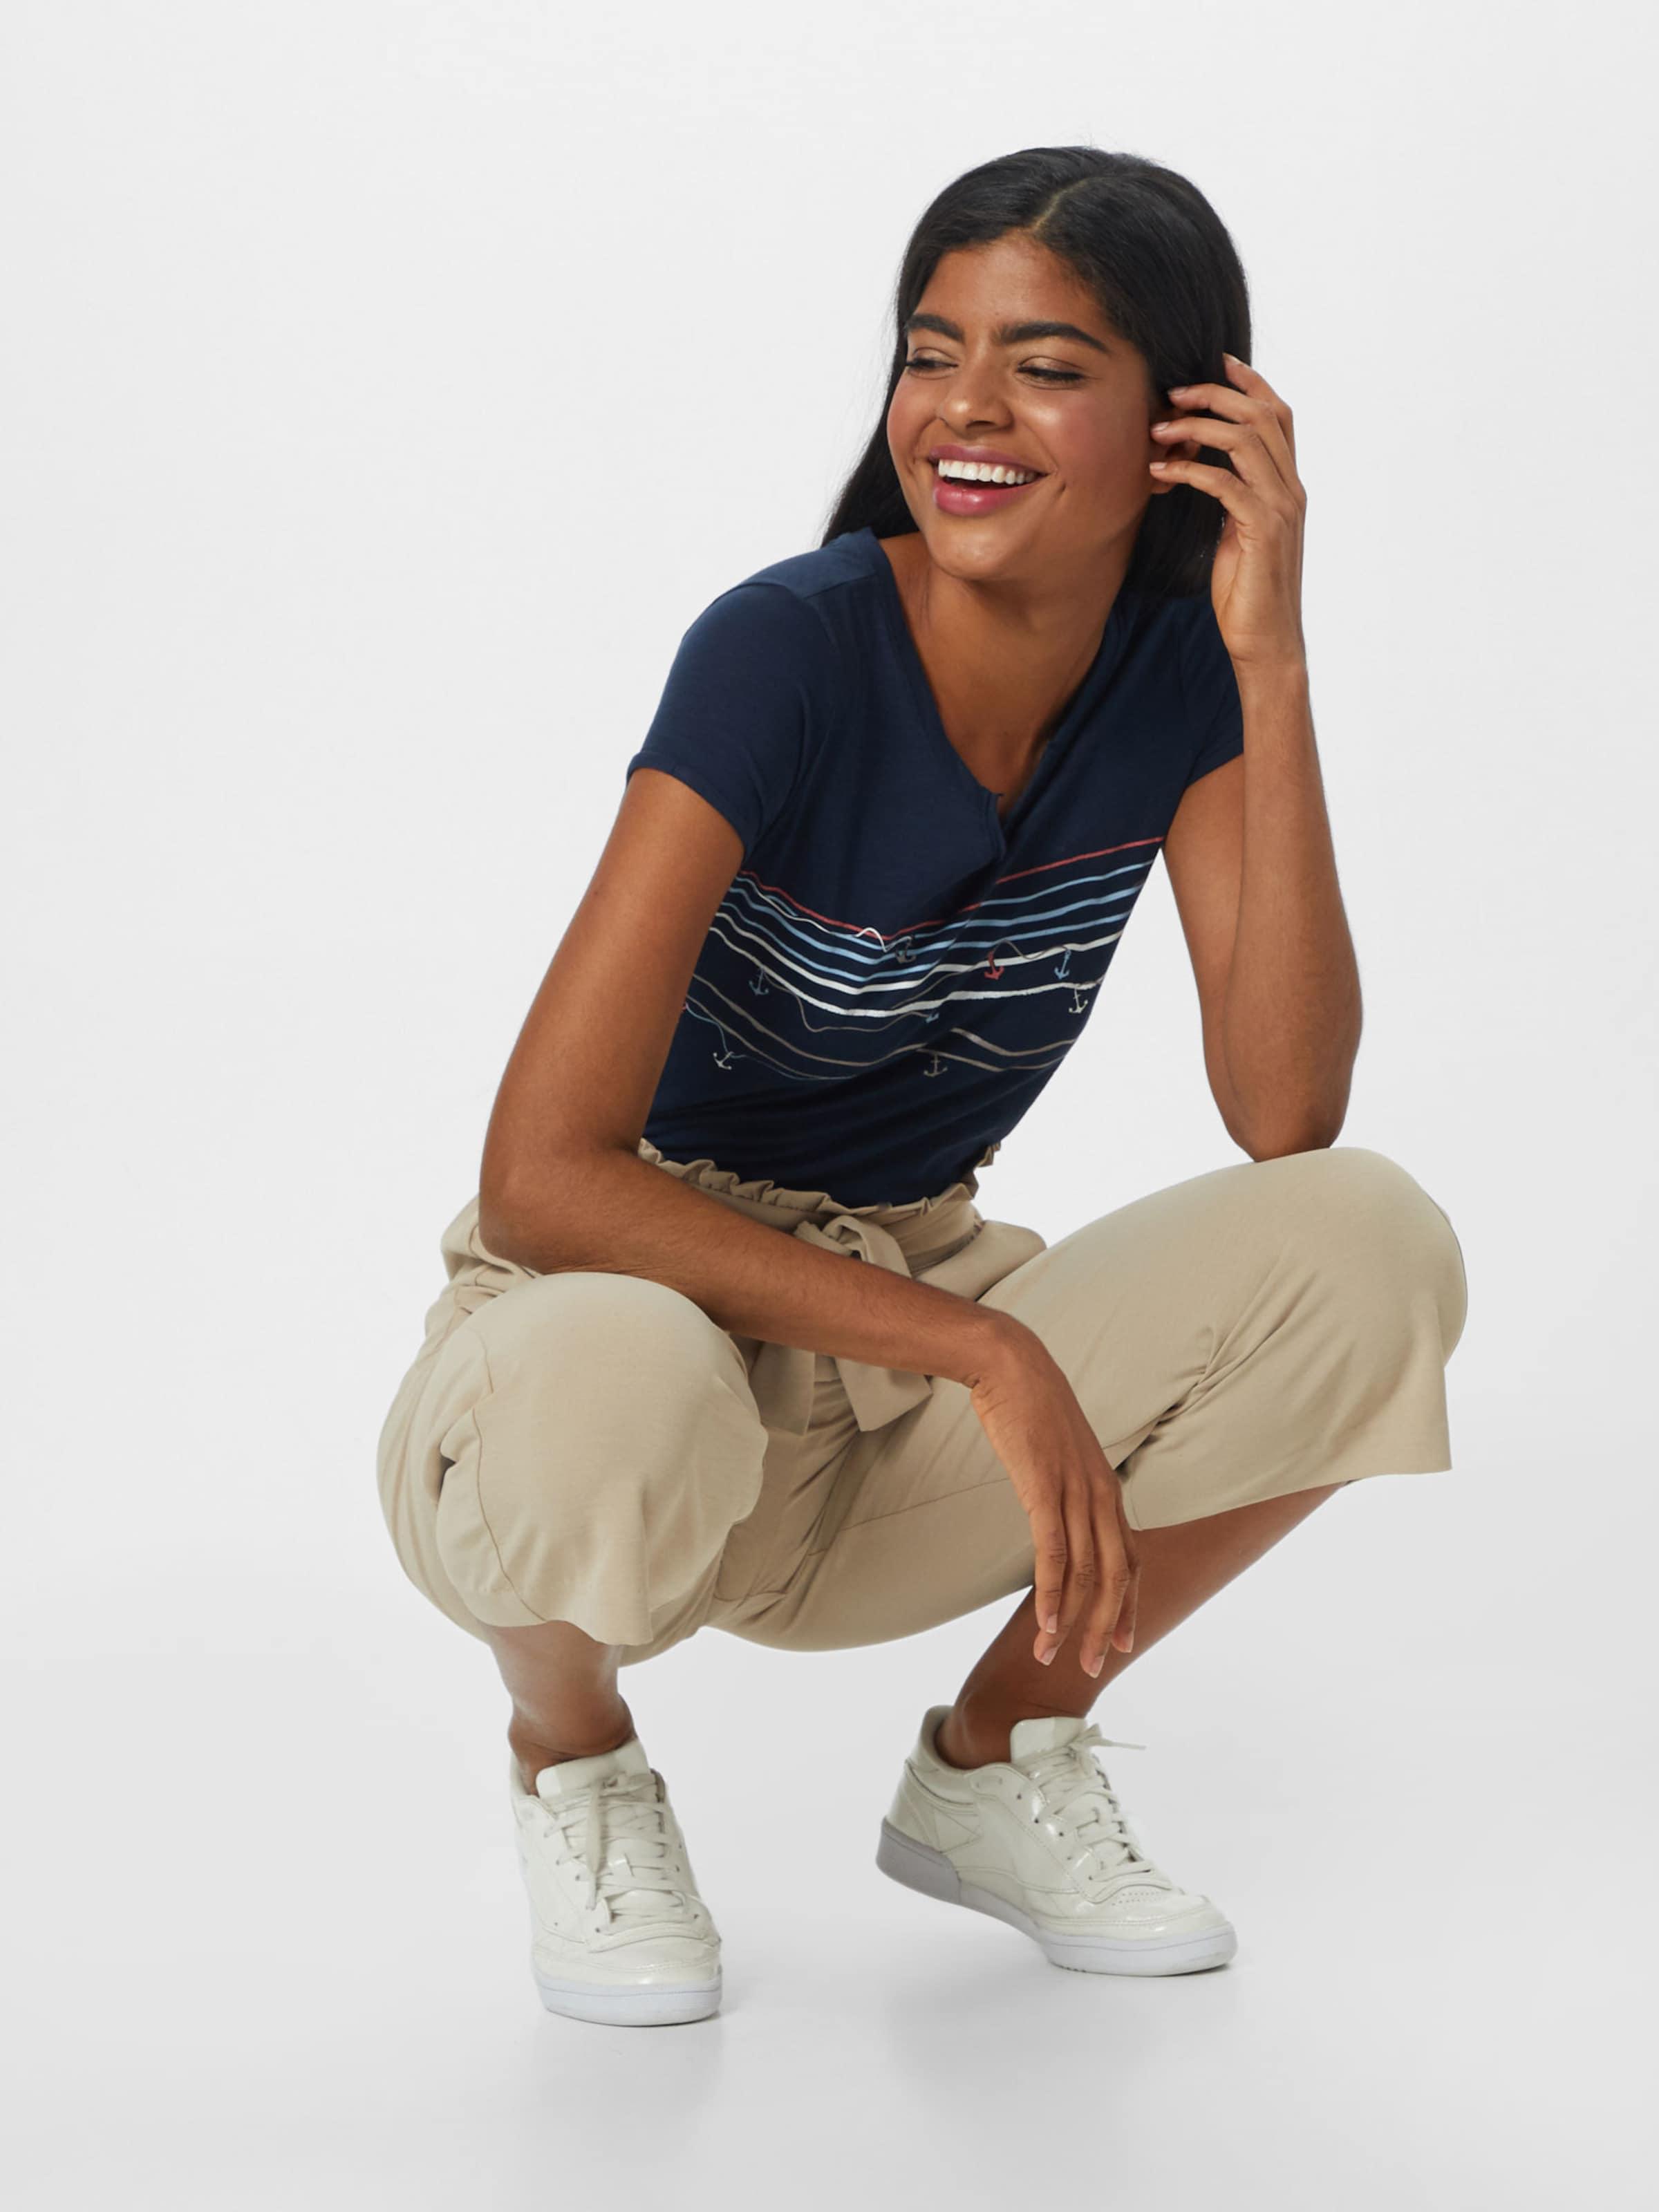 Esprit shirt Argent Bleu MarineClair T Print 'aw Blanc En Saumon Tee' 5A43jLqR